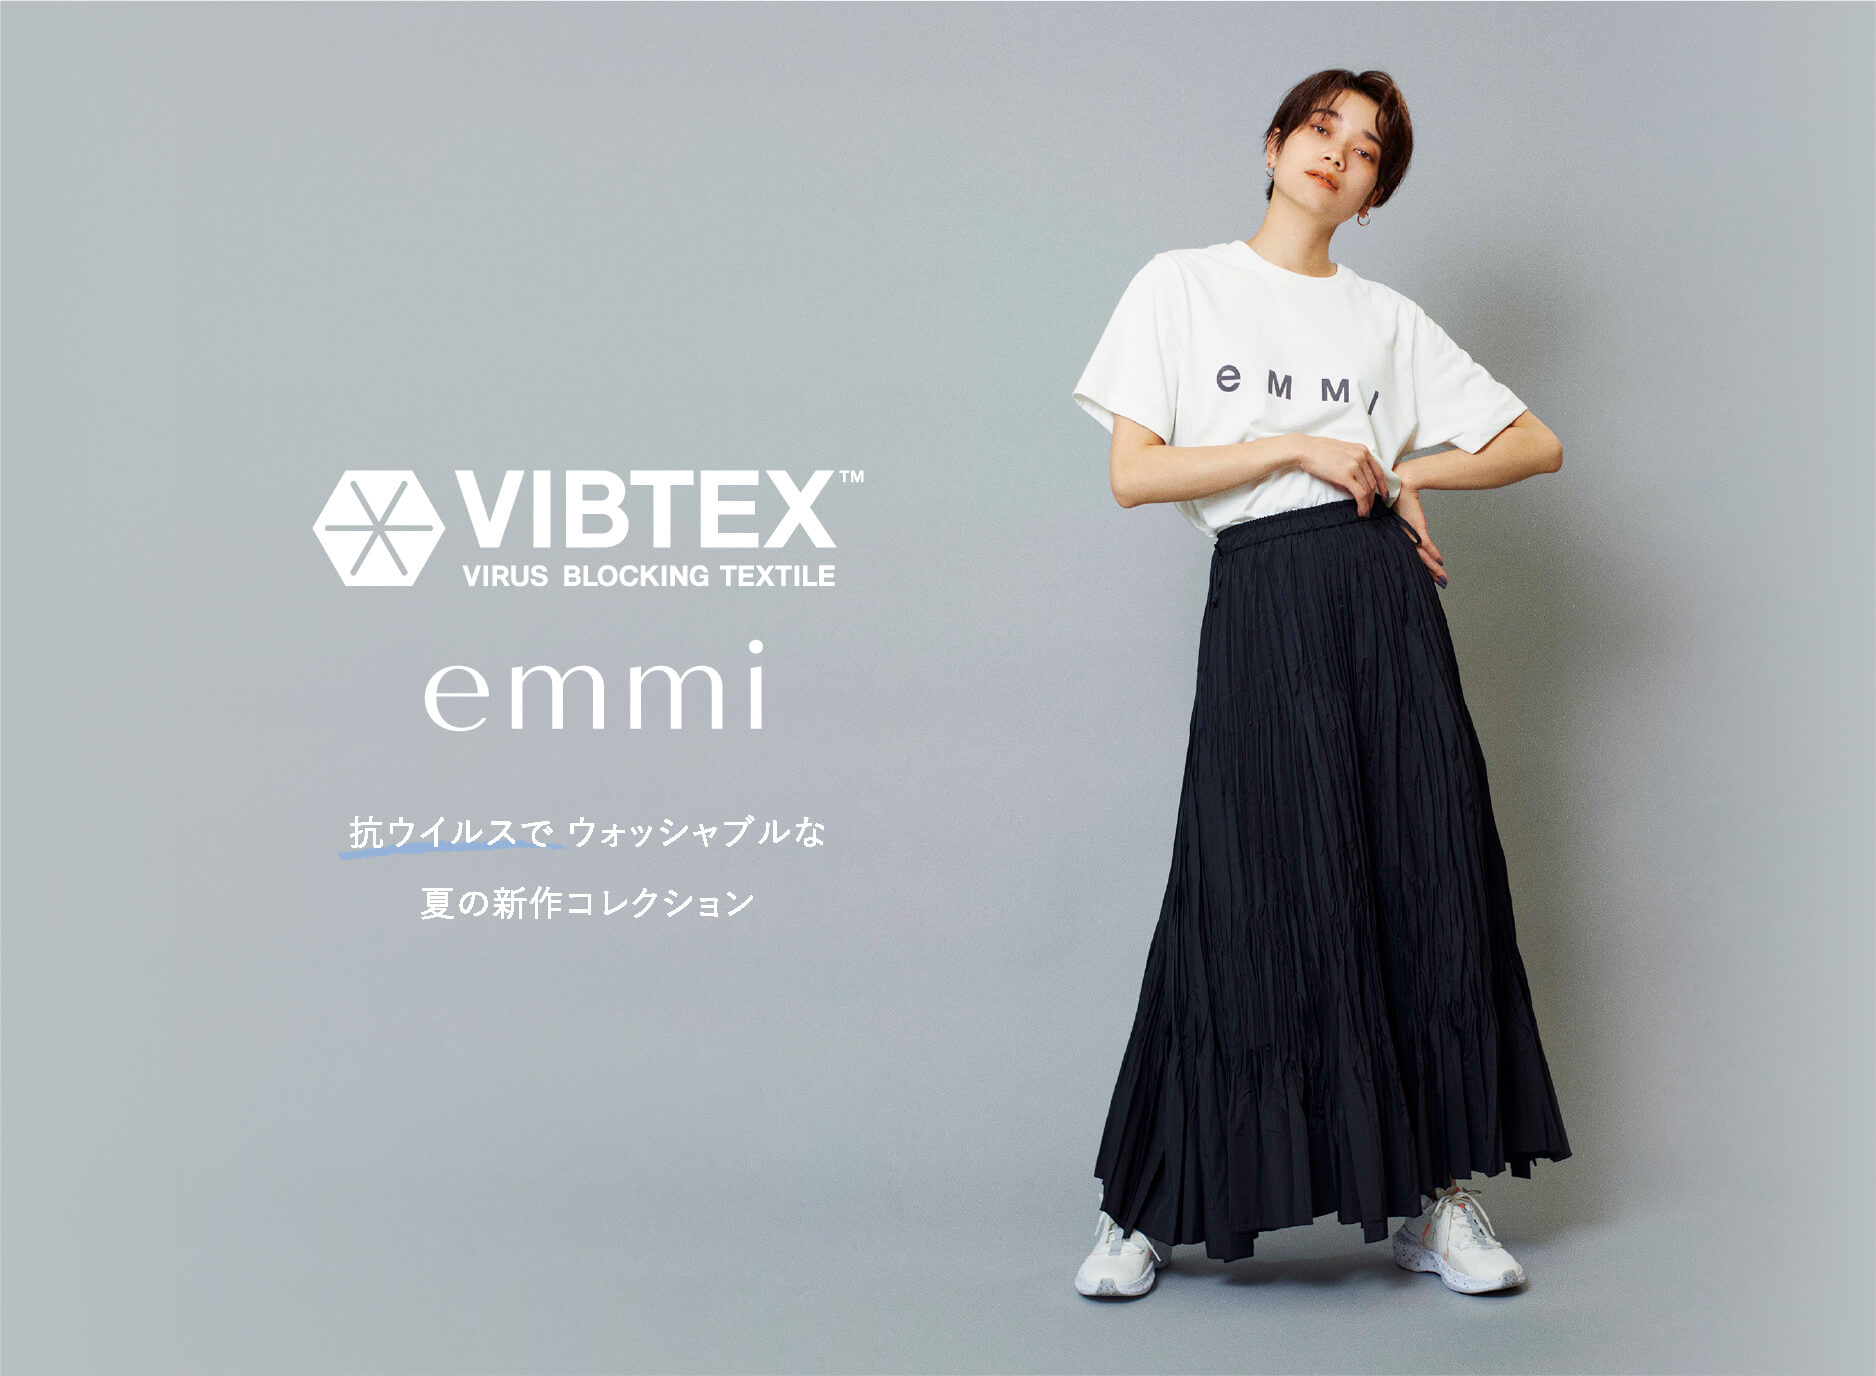 VIBTEX emmi VIRUS BLOCKING TEXTILE